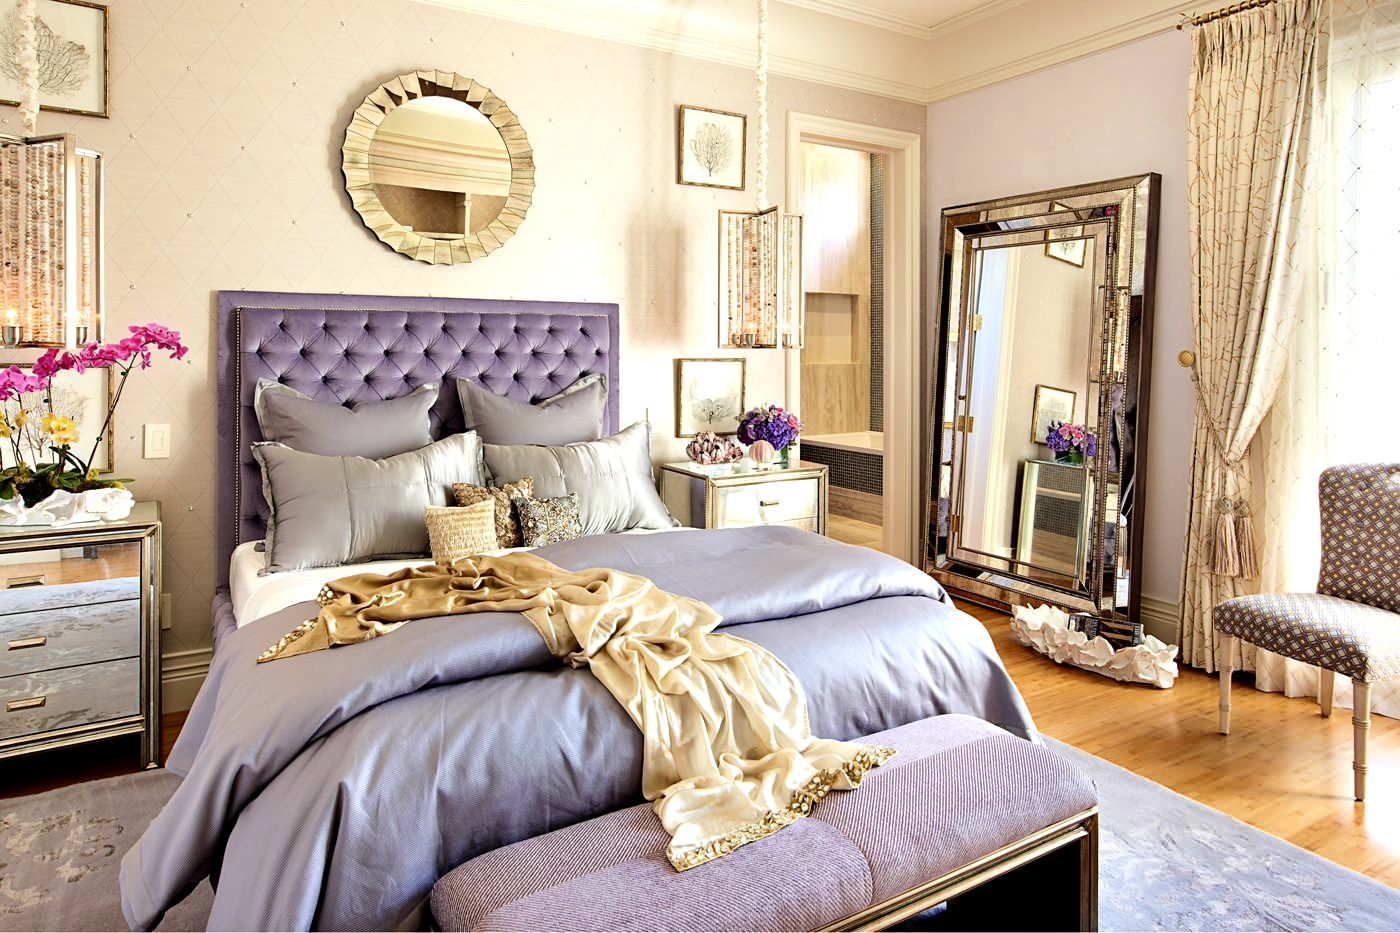 entracing young girls room ideas. Accessories Entrancing Steps Girly Adult Bedroom Girl Bedrooms Las Vegas  Purple Princess Idea Shop Room